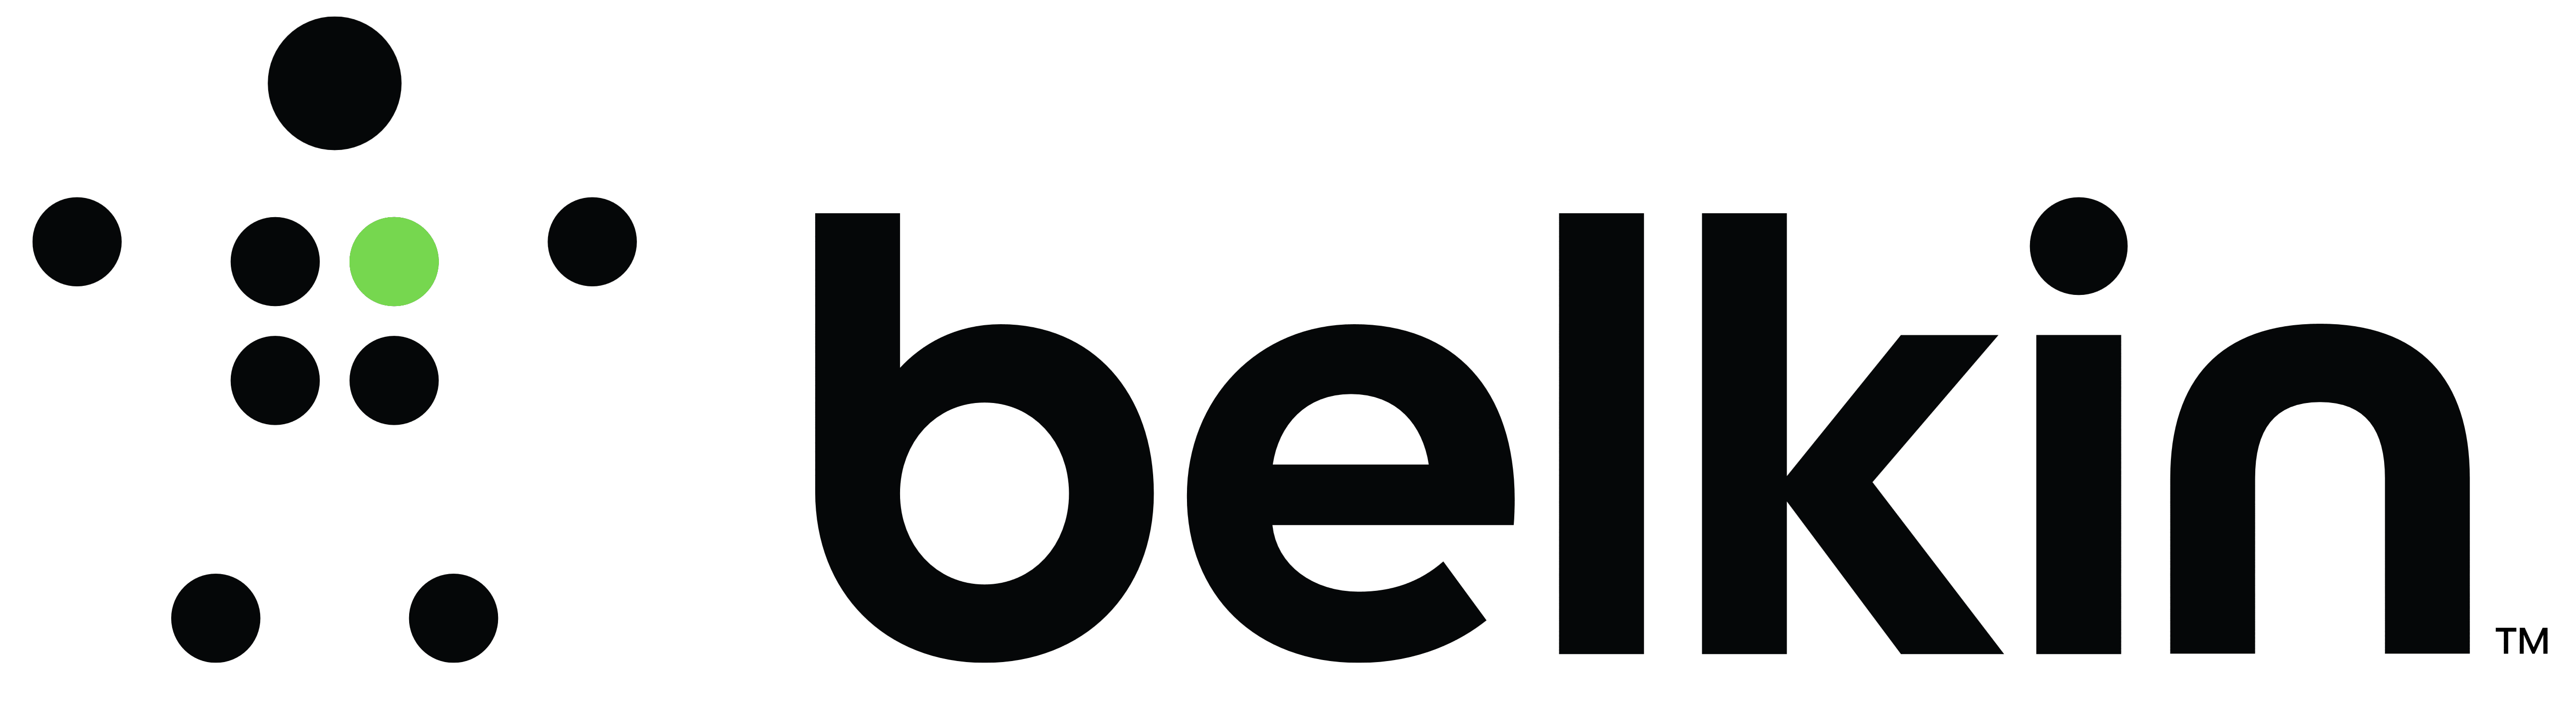 Belkin N600 Setup